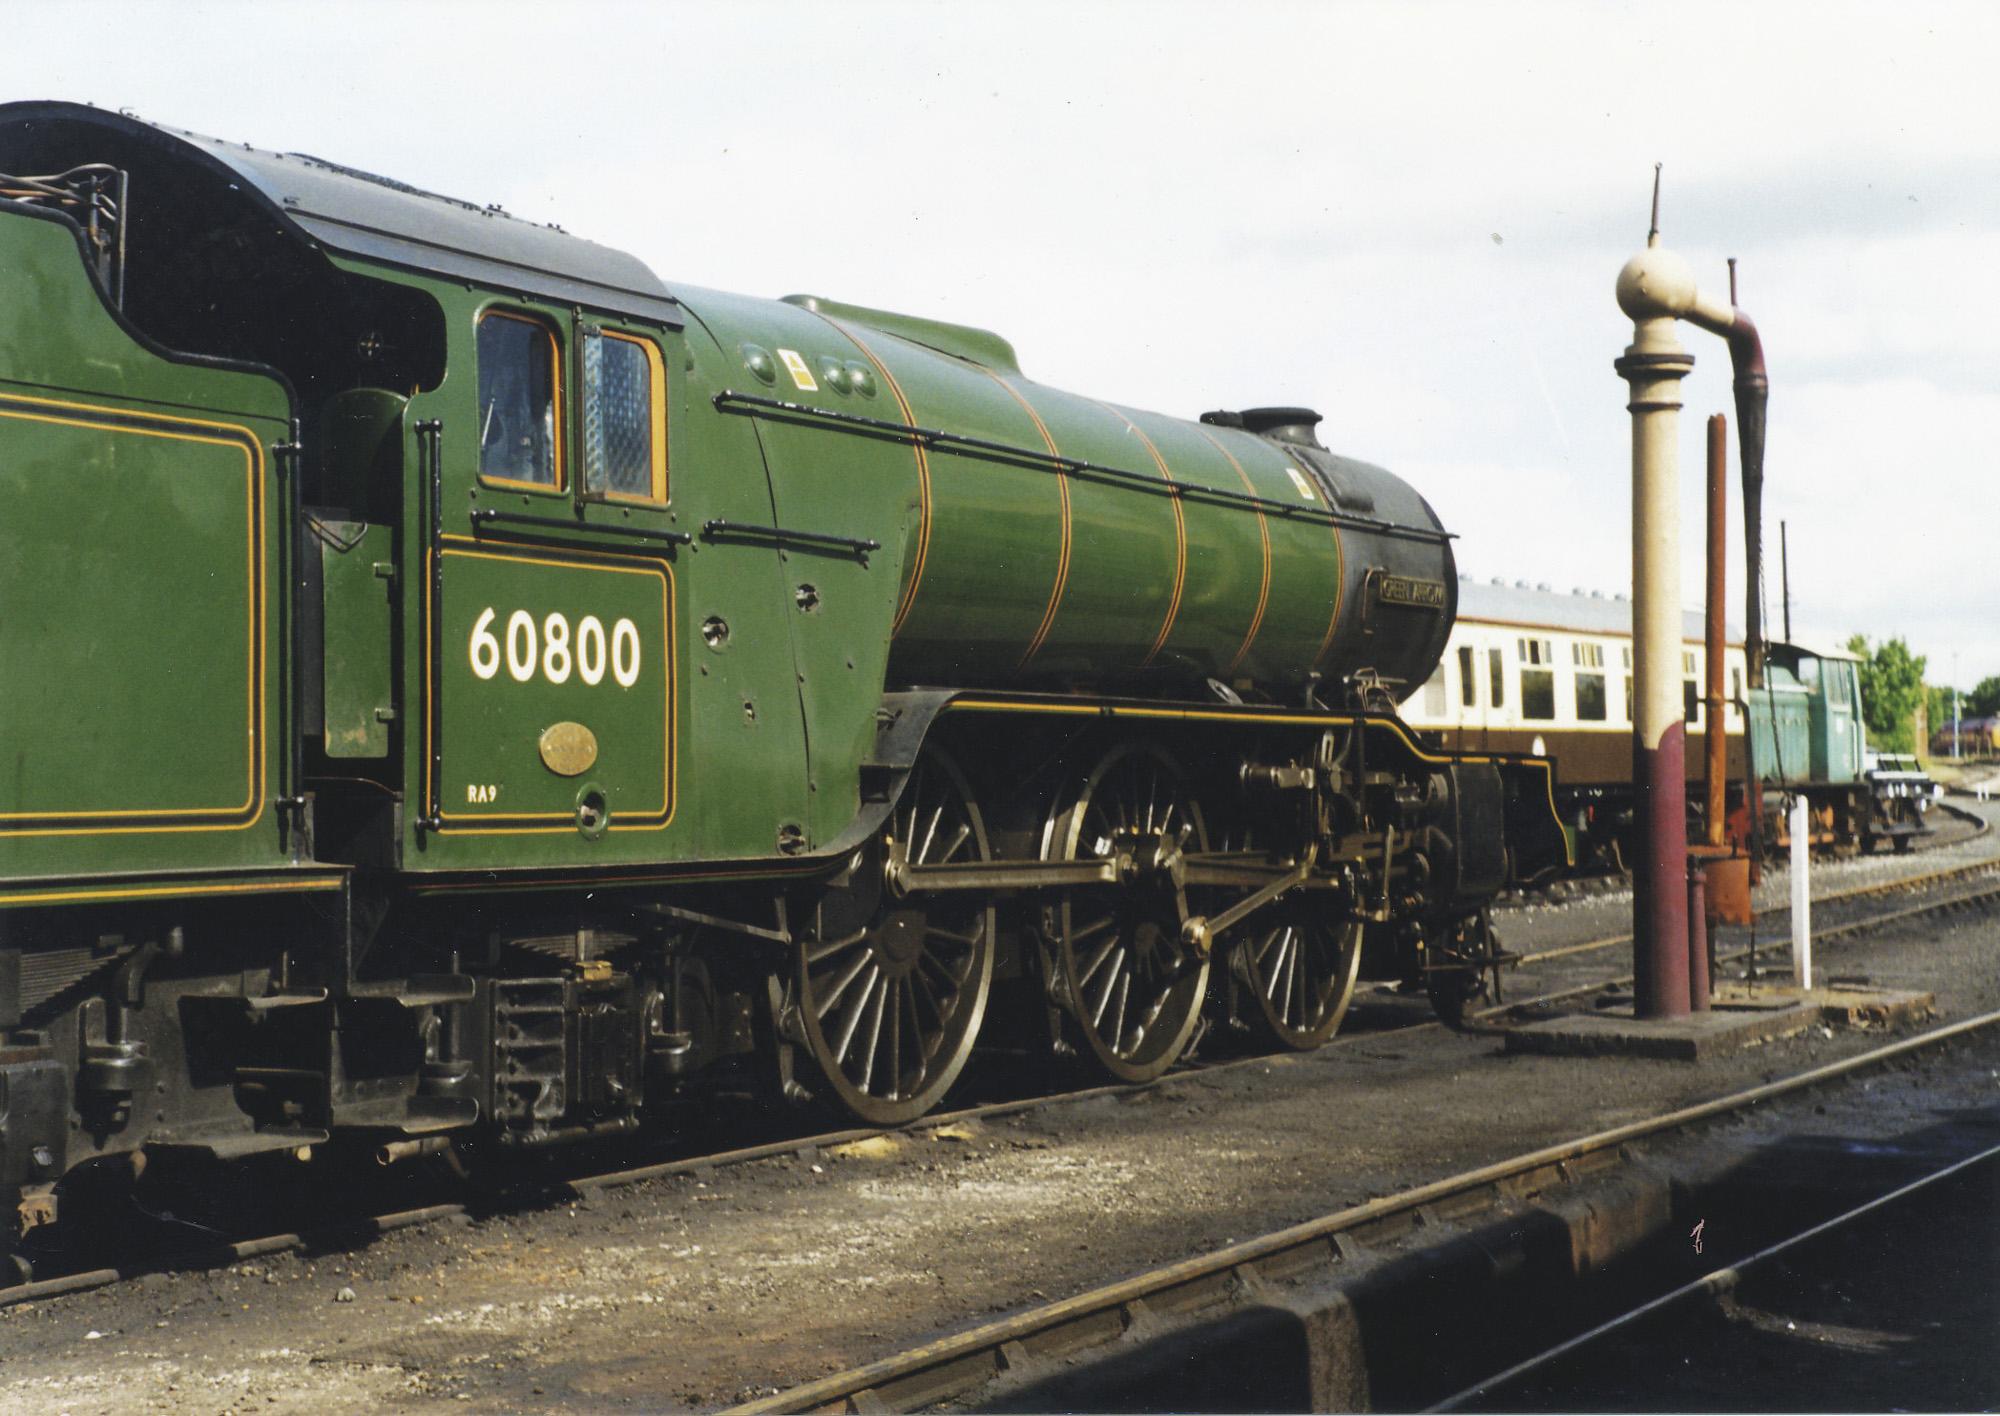 60800 Green Arrow. © Bob Robson/6024 PS Ltd